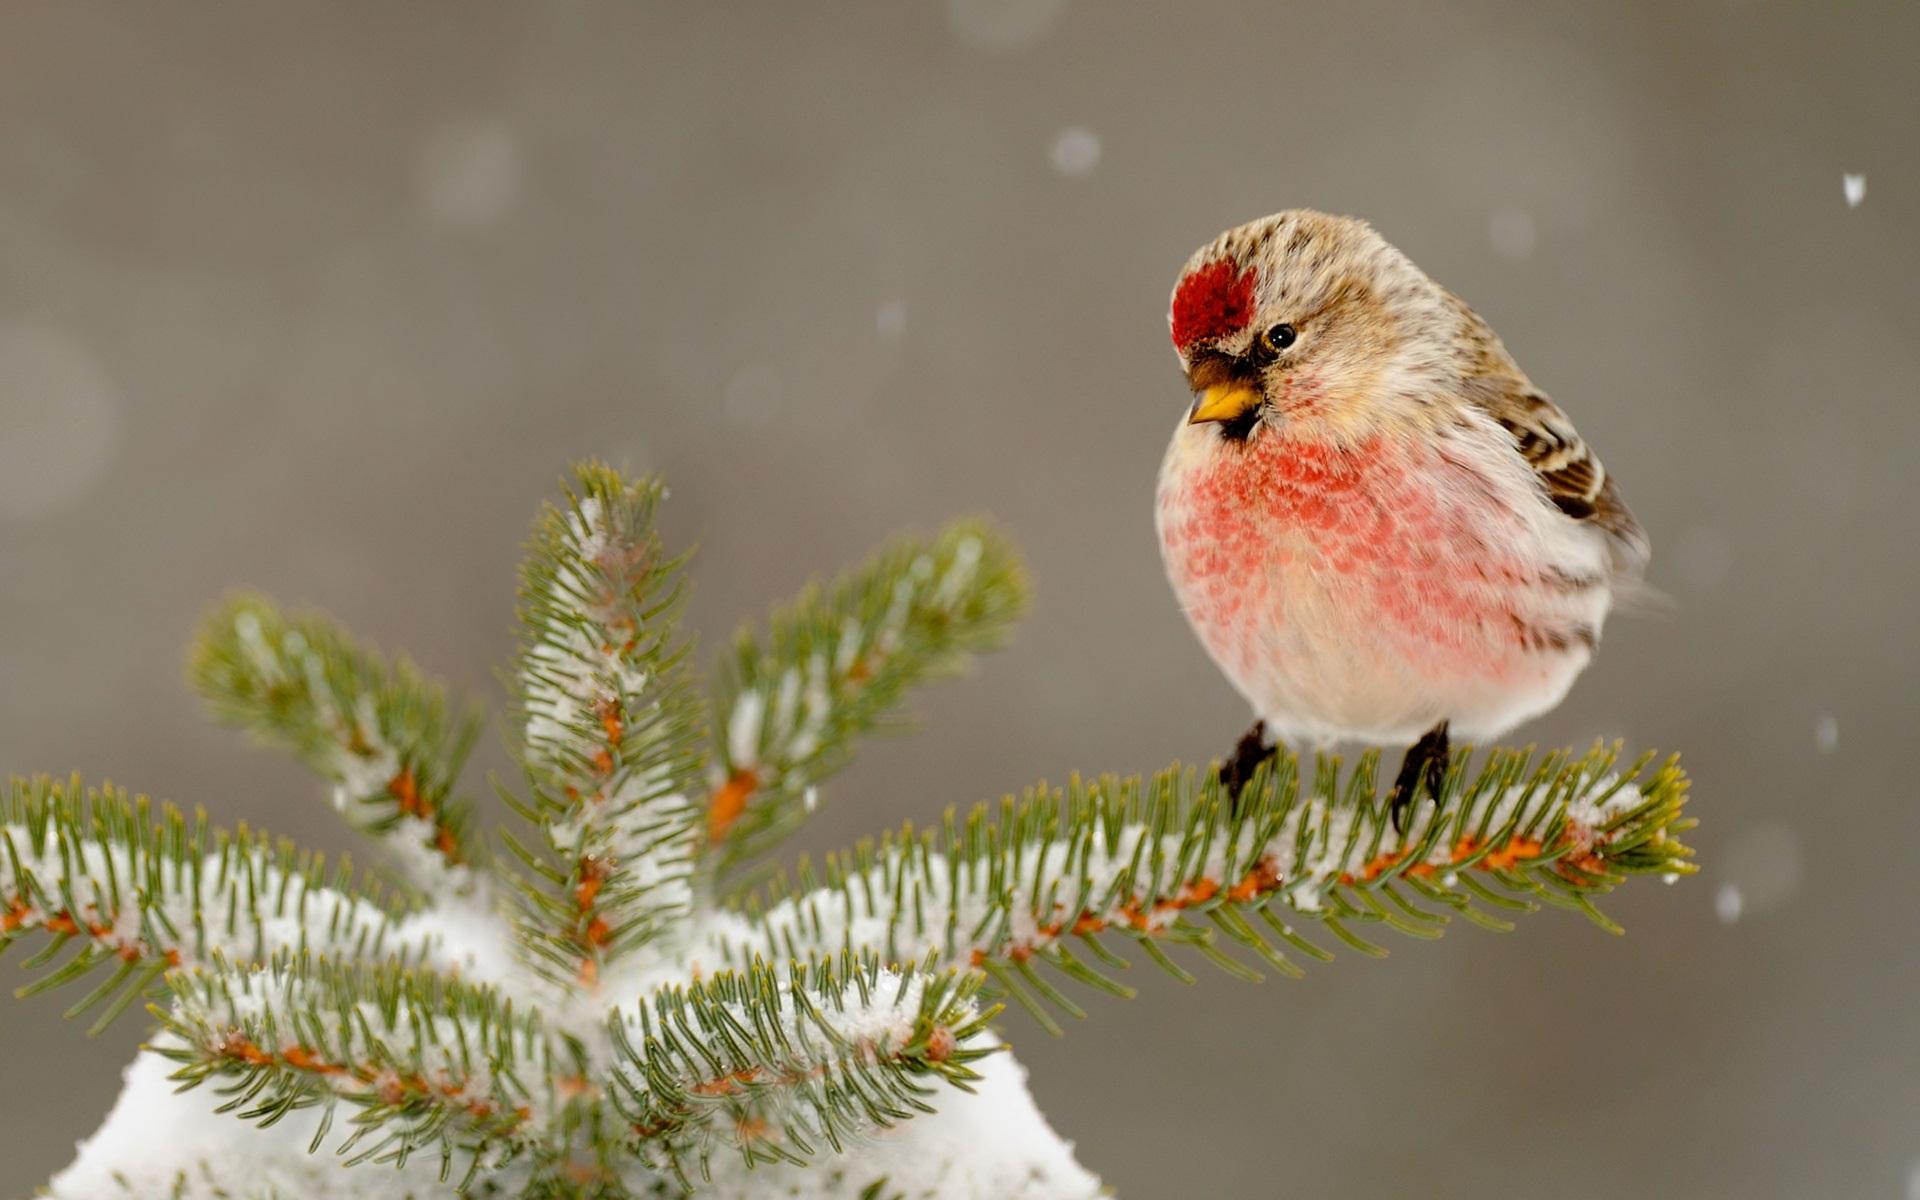 Falling Snow Wallpaper Iphone 5 Bird Full Hd Wallpaper And Hintergrund 1920x1200 Id 476028